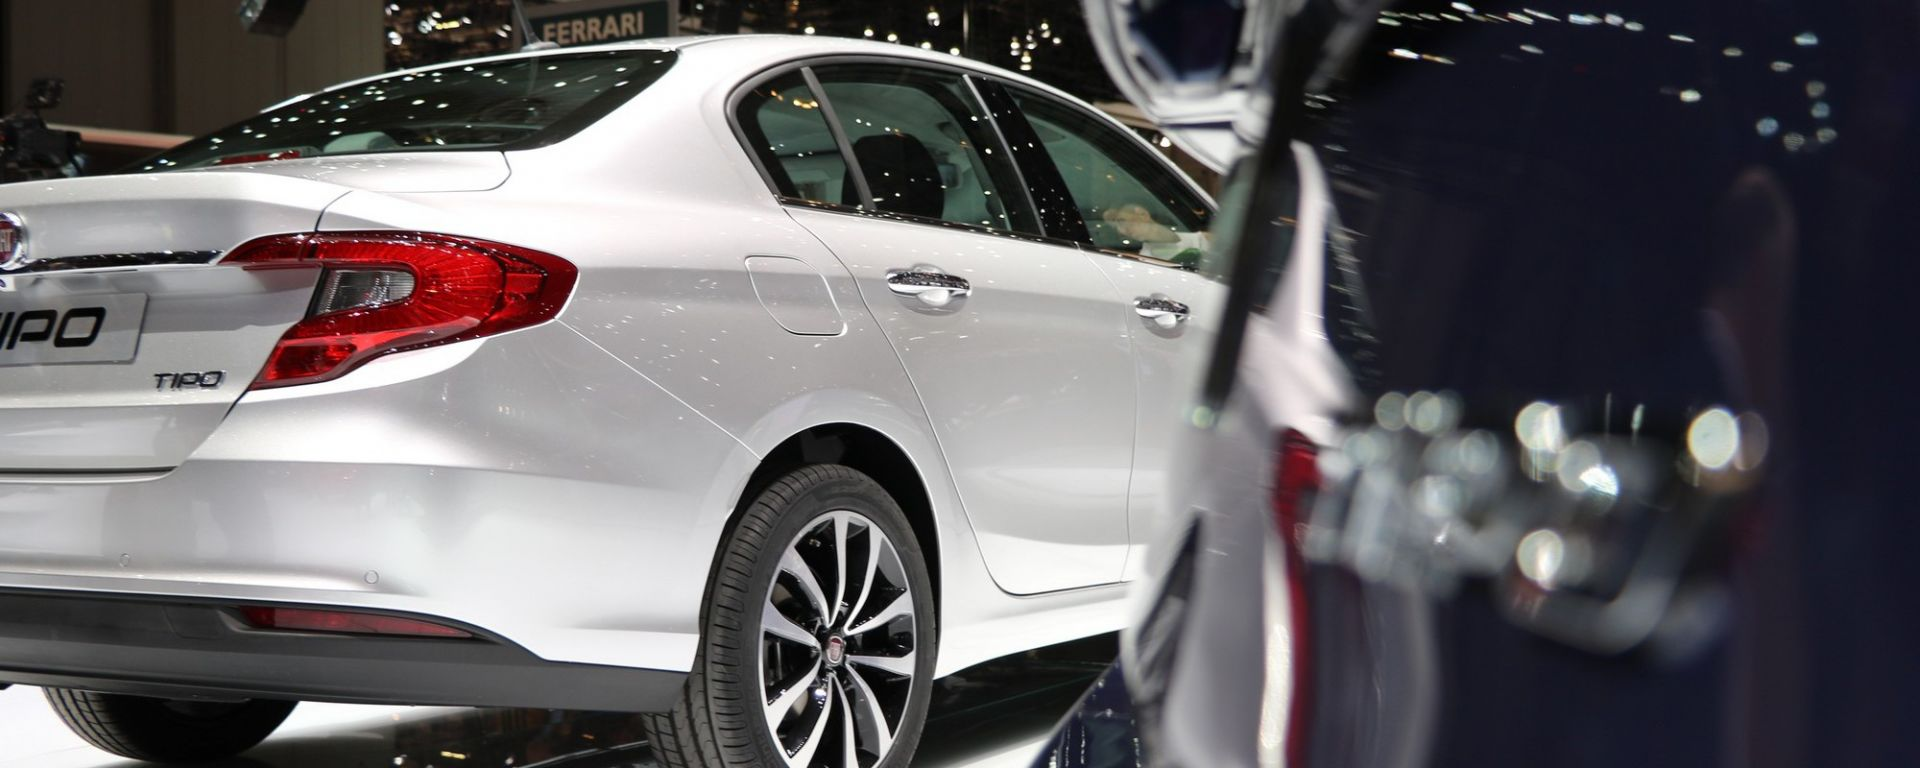 Ginevra 2016 - Notizie dalle Case: Fiat